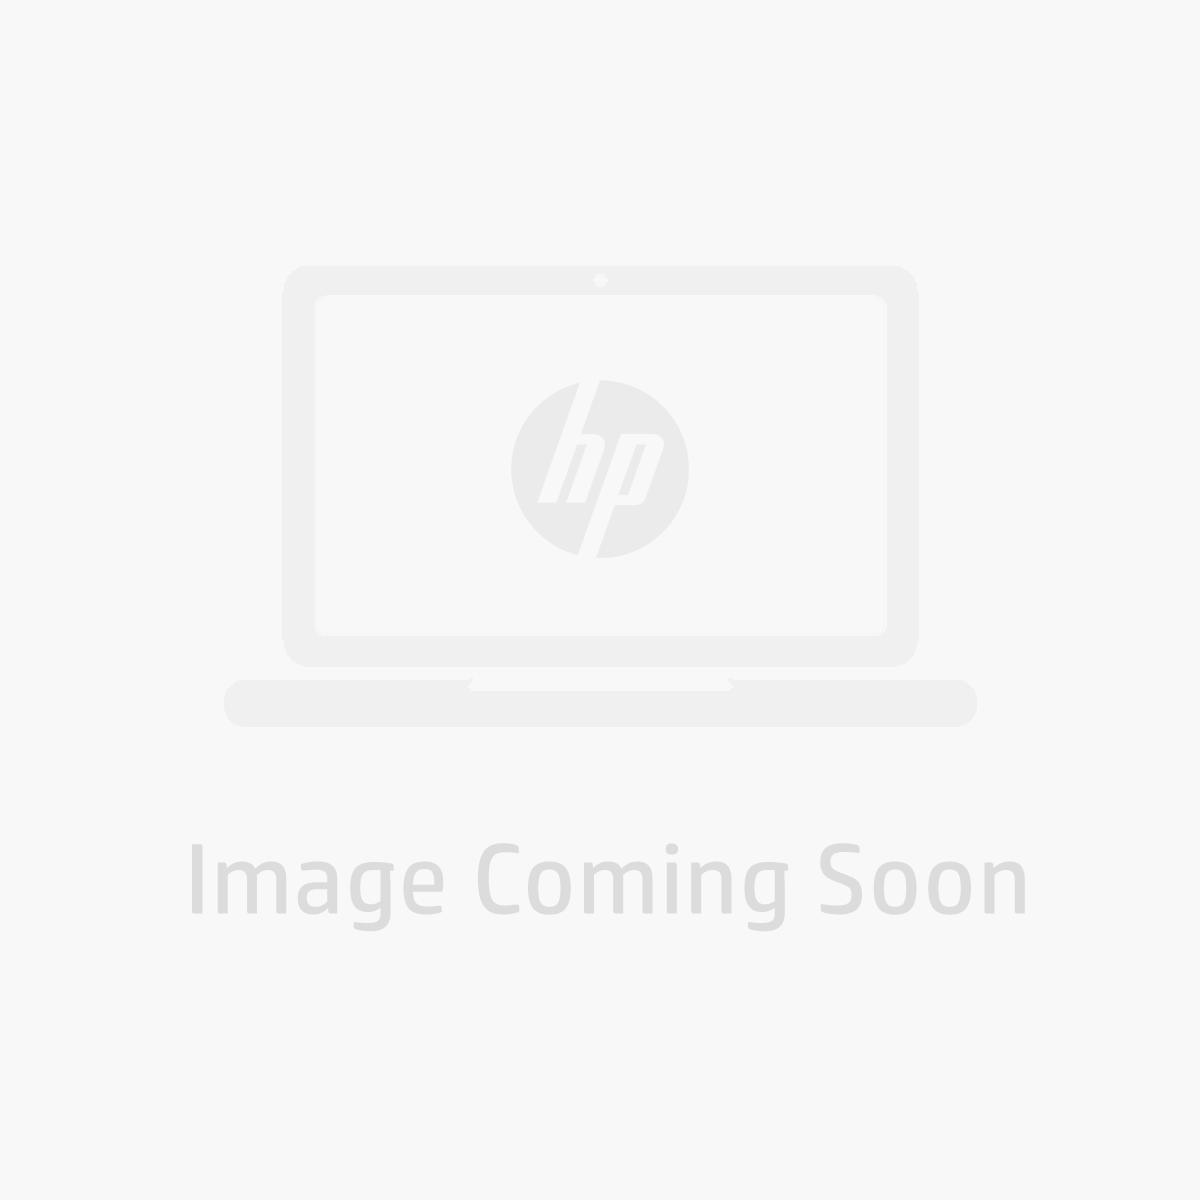 HP Colour LaserJet Professional CP5225n Printer